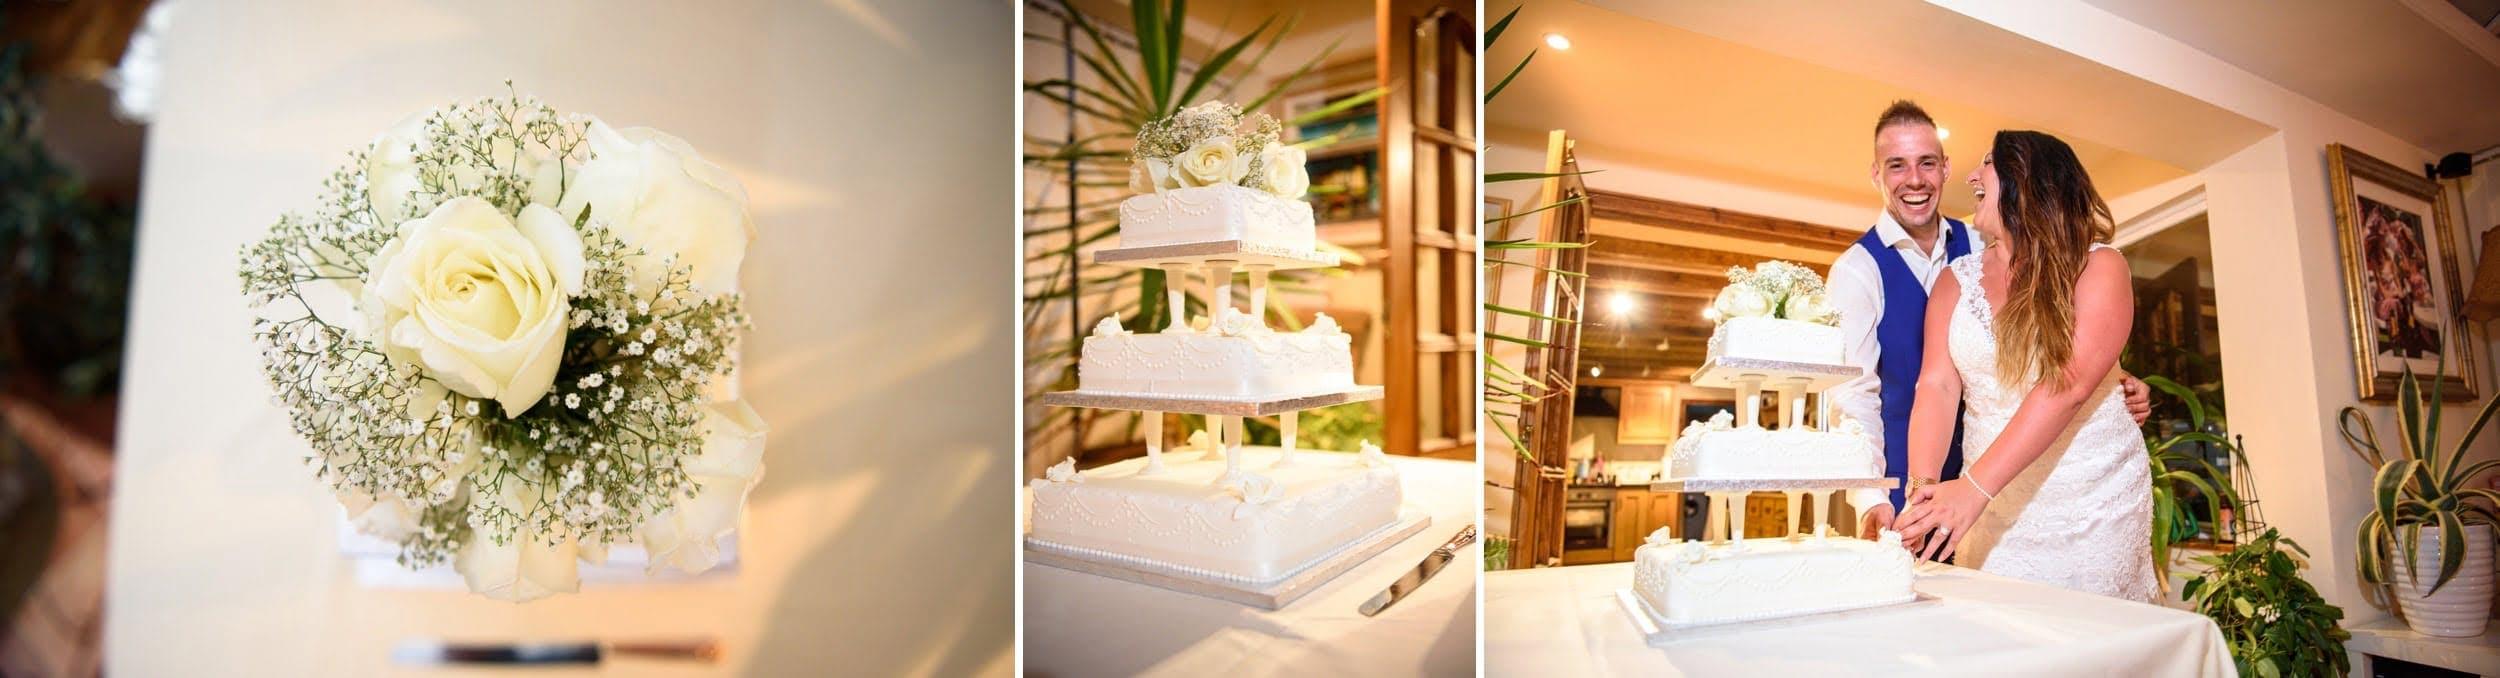 norfolk_wedding_reception-3